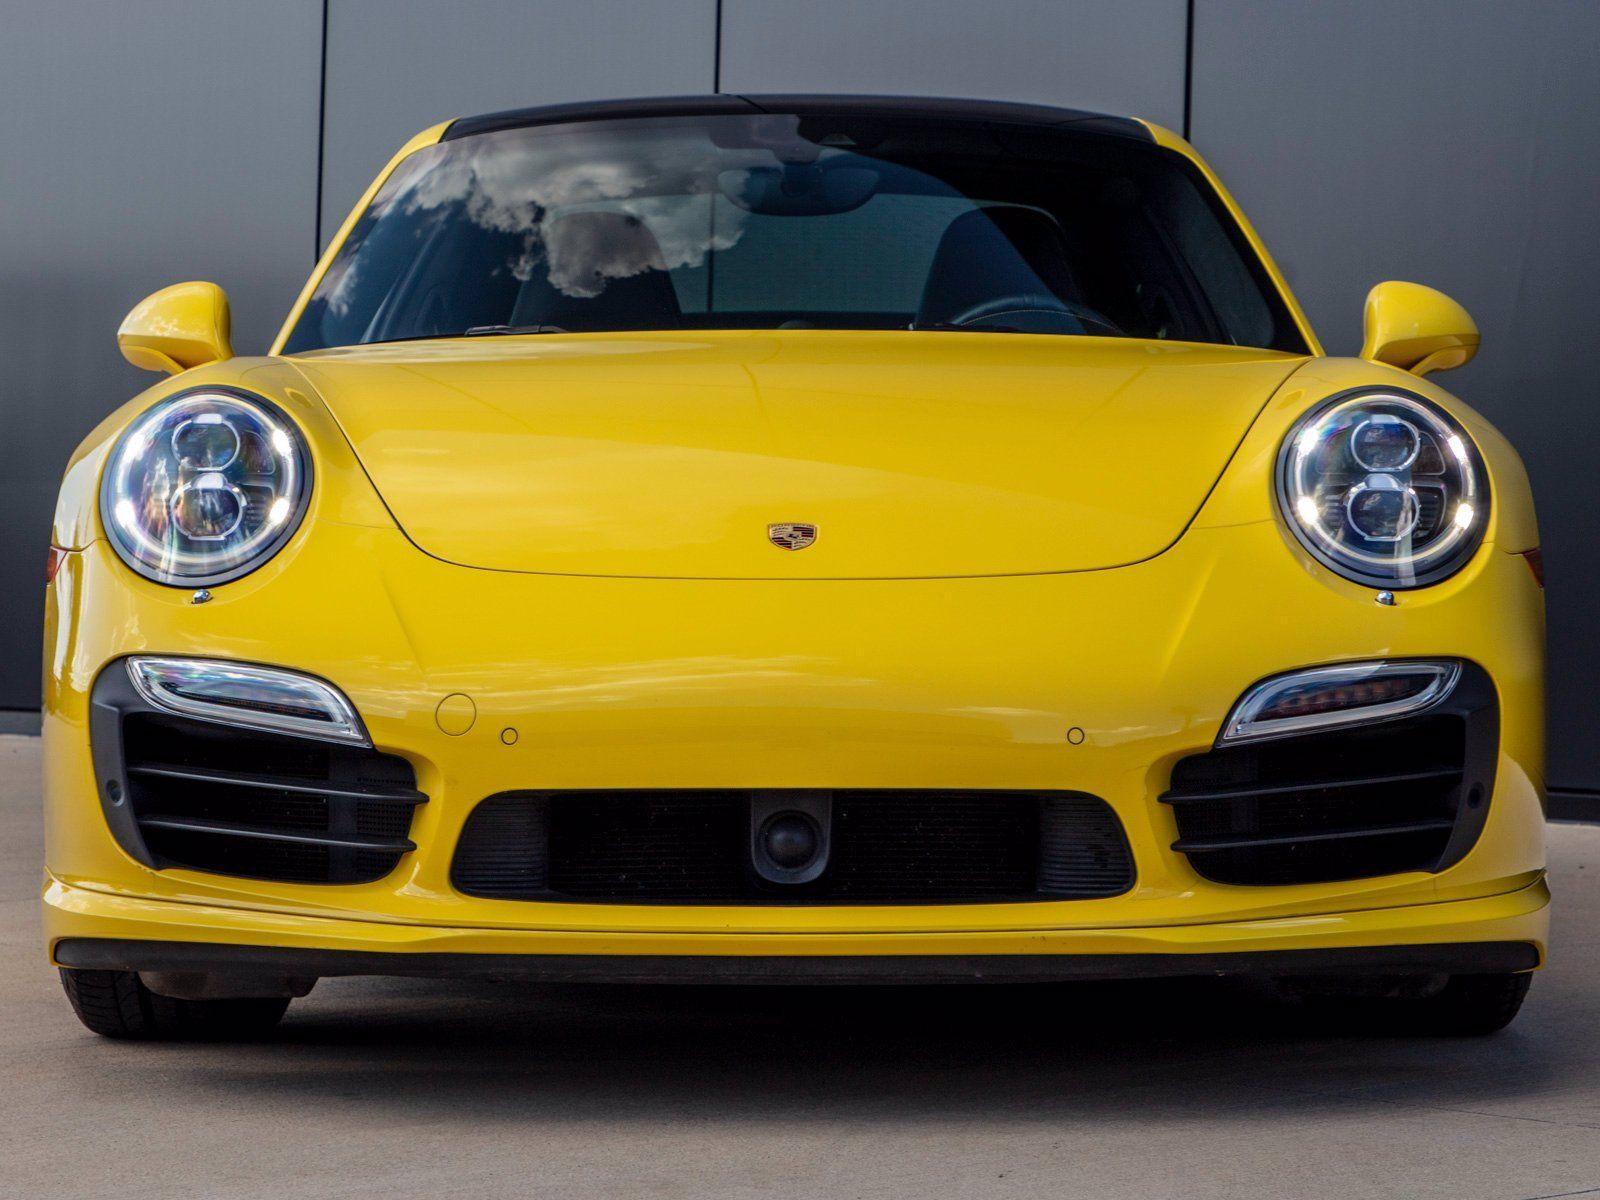 2014 Porsche 911 Turbo S – 4